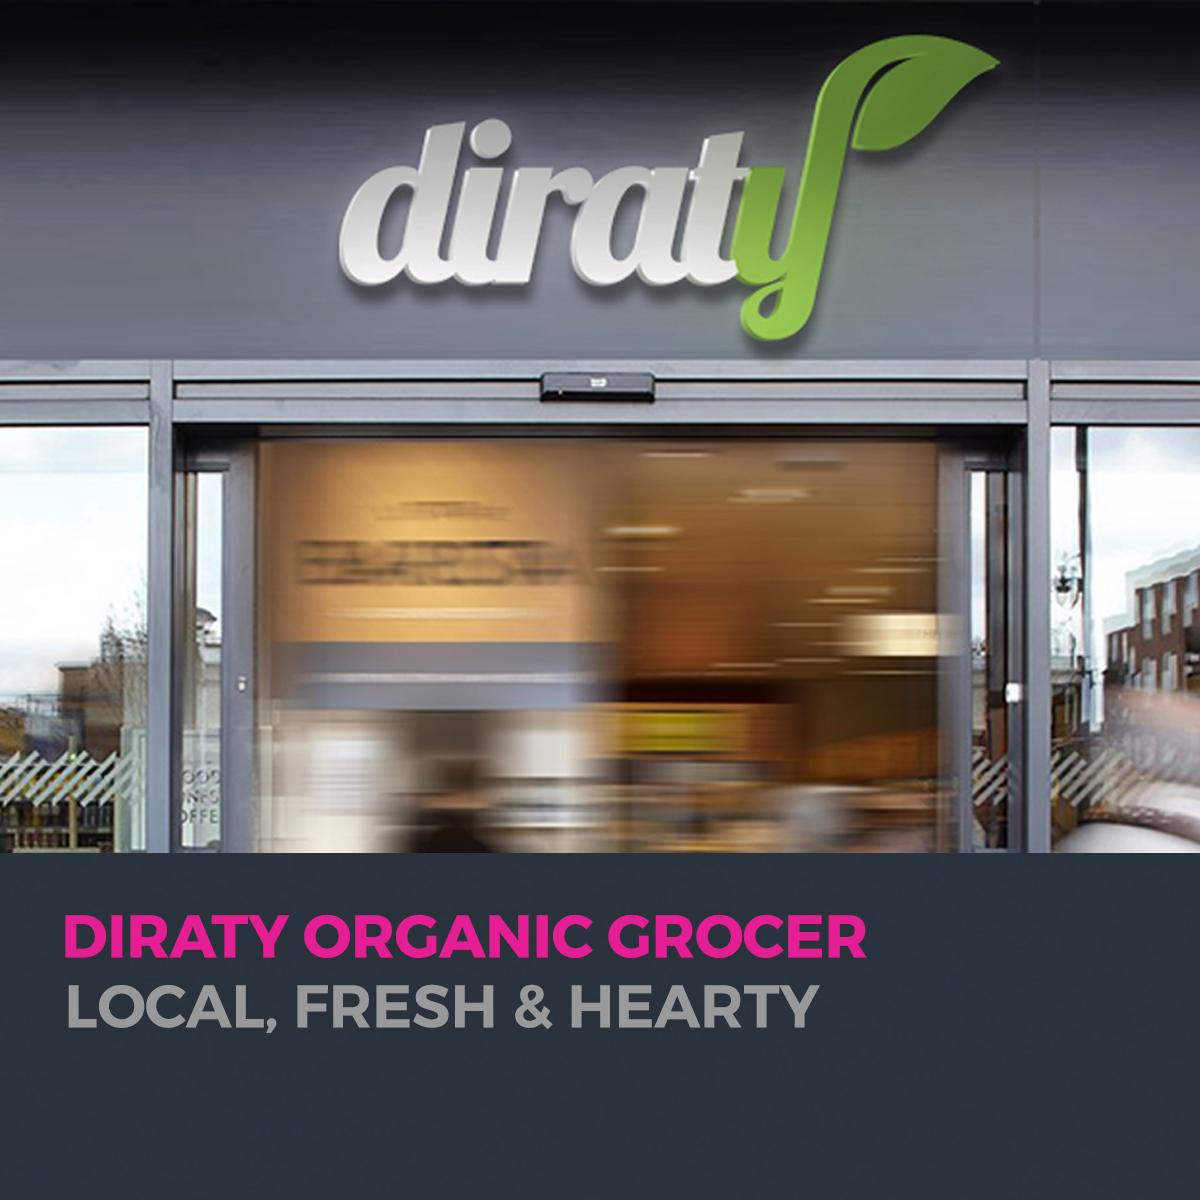 Diraty grocery store